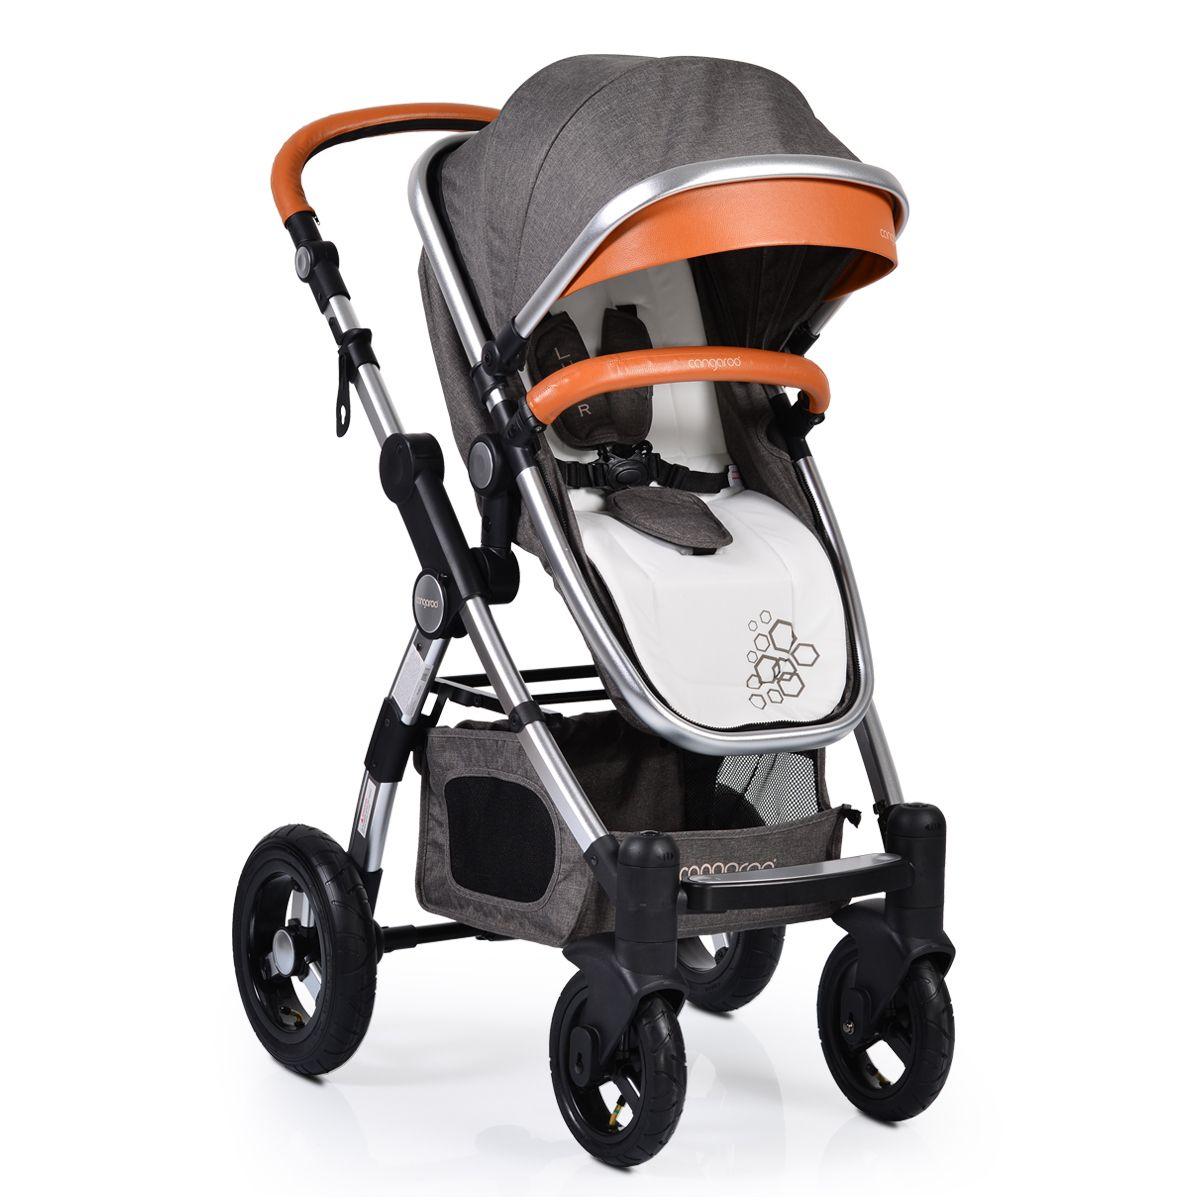 Cangaroo Комбинирана детска количка Luxor First baby